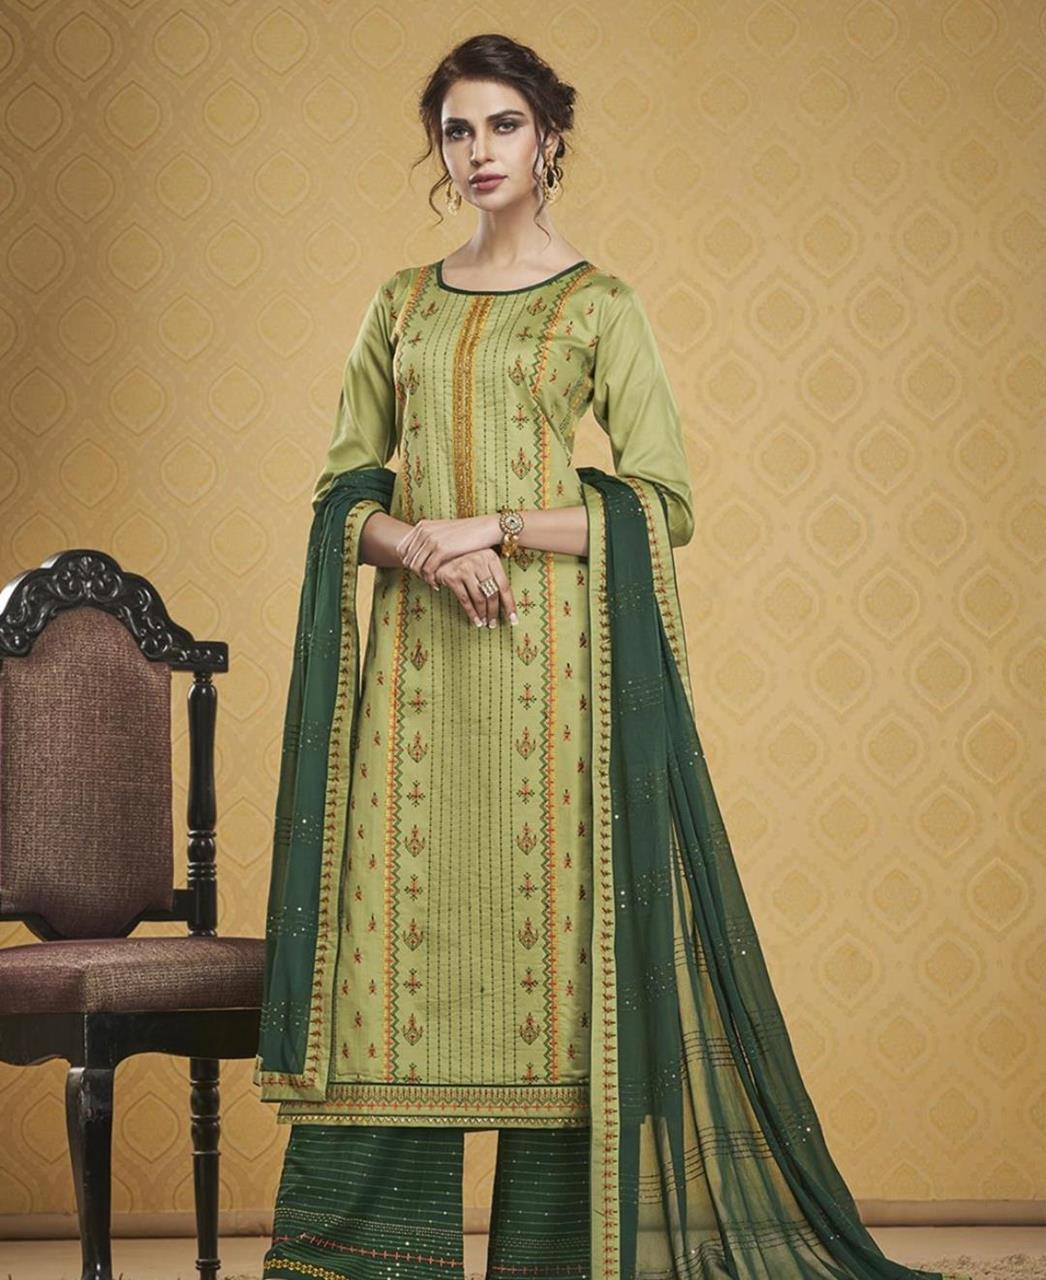 HandWorked Silk Straight cut Salwar Kameez in Light Green